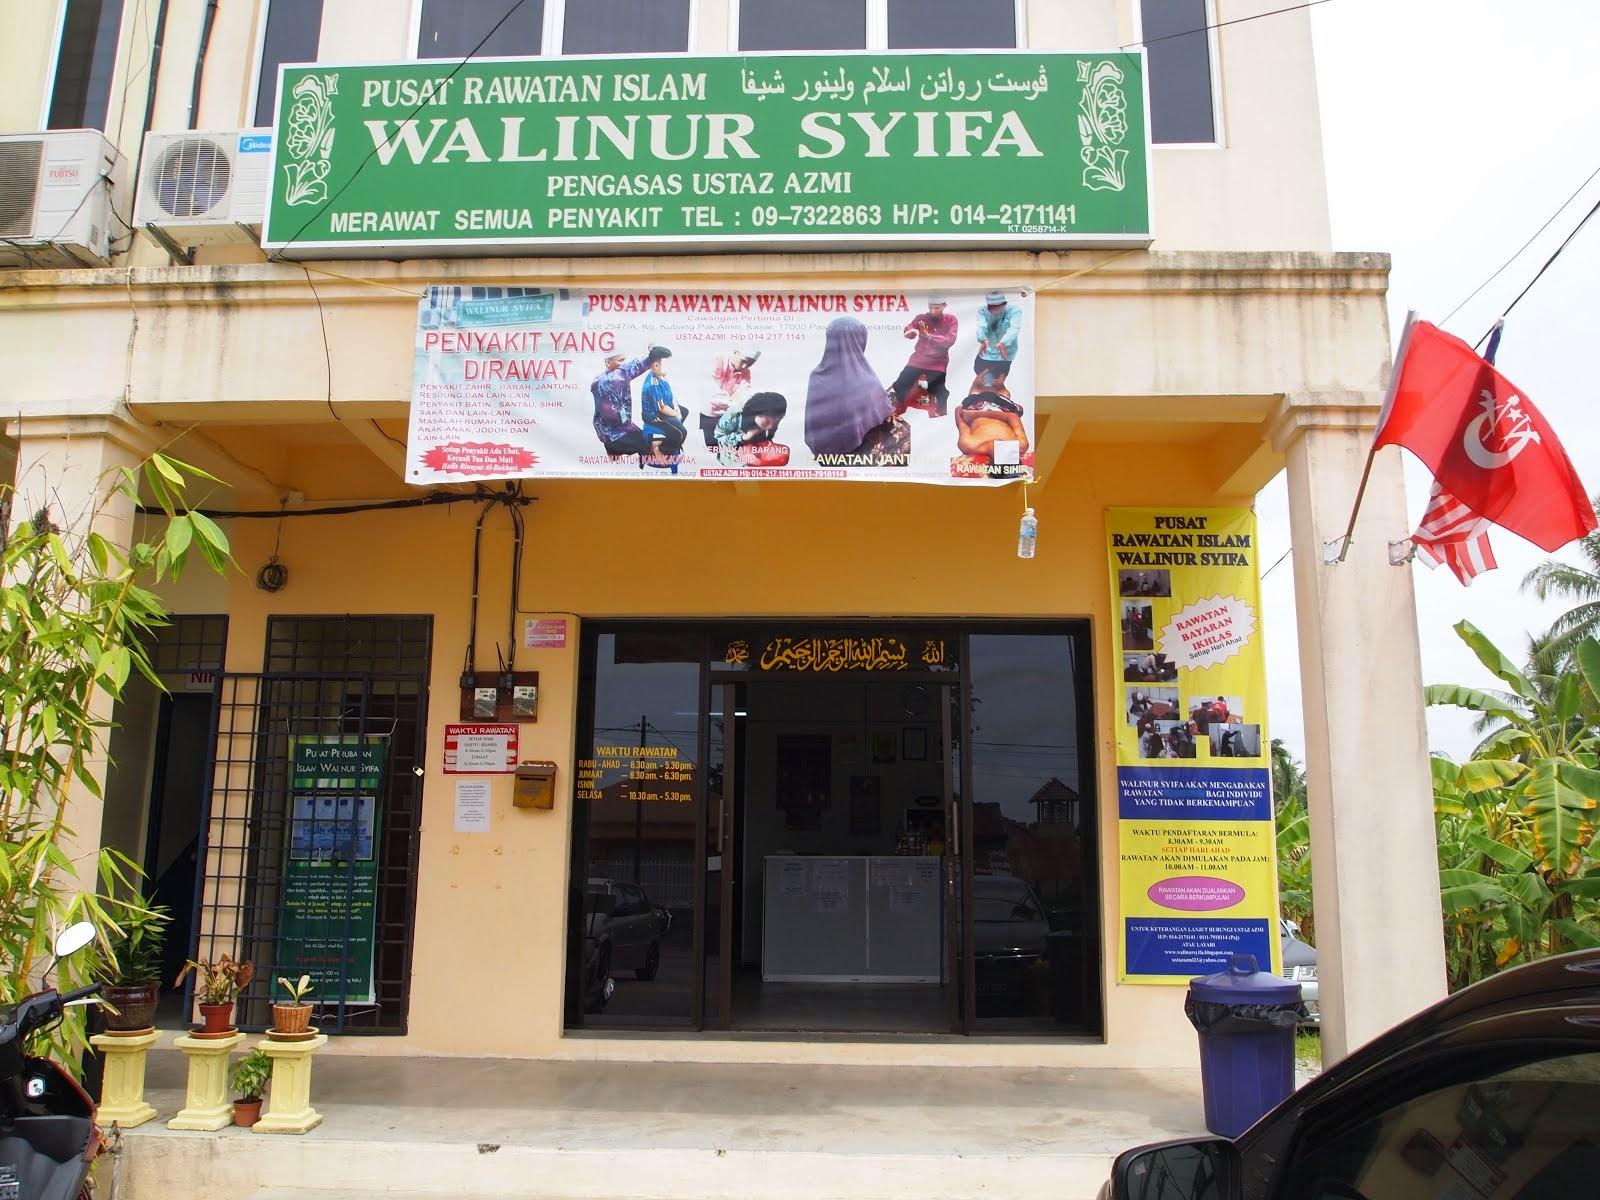 Lokasi Pusat Rawatan Walinur Syifa